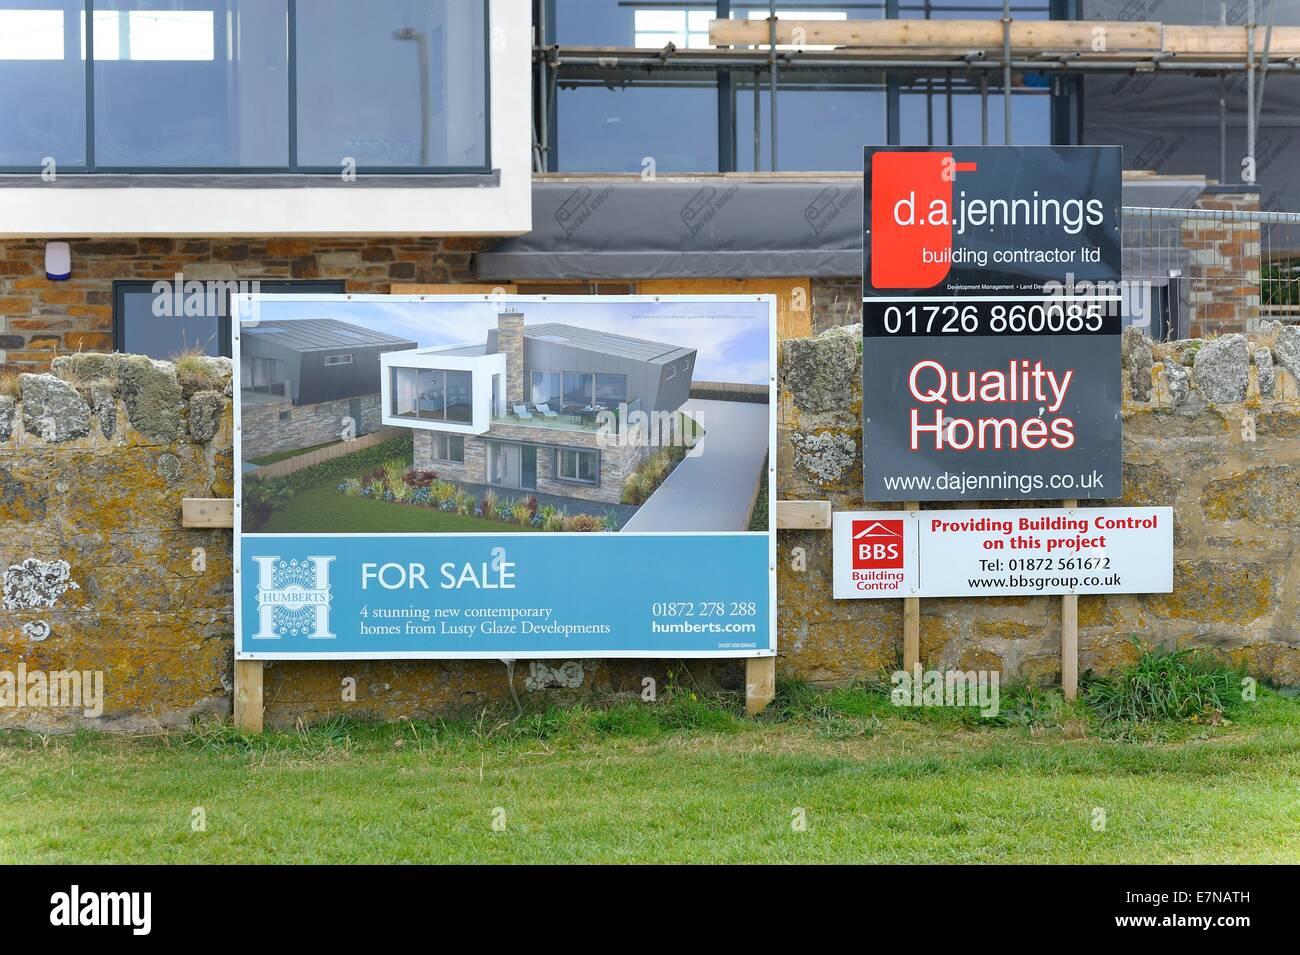 New Build Homes With Sea Views Lusty Glaze Newquay Cornwall England Uk    Stock Image